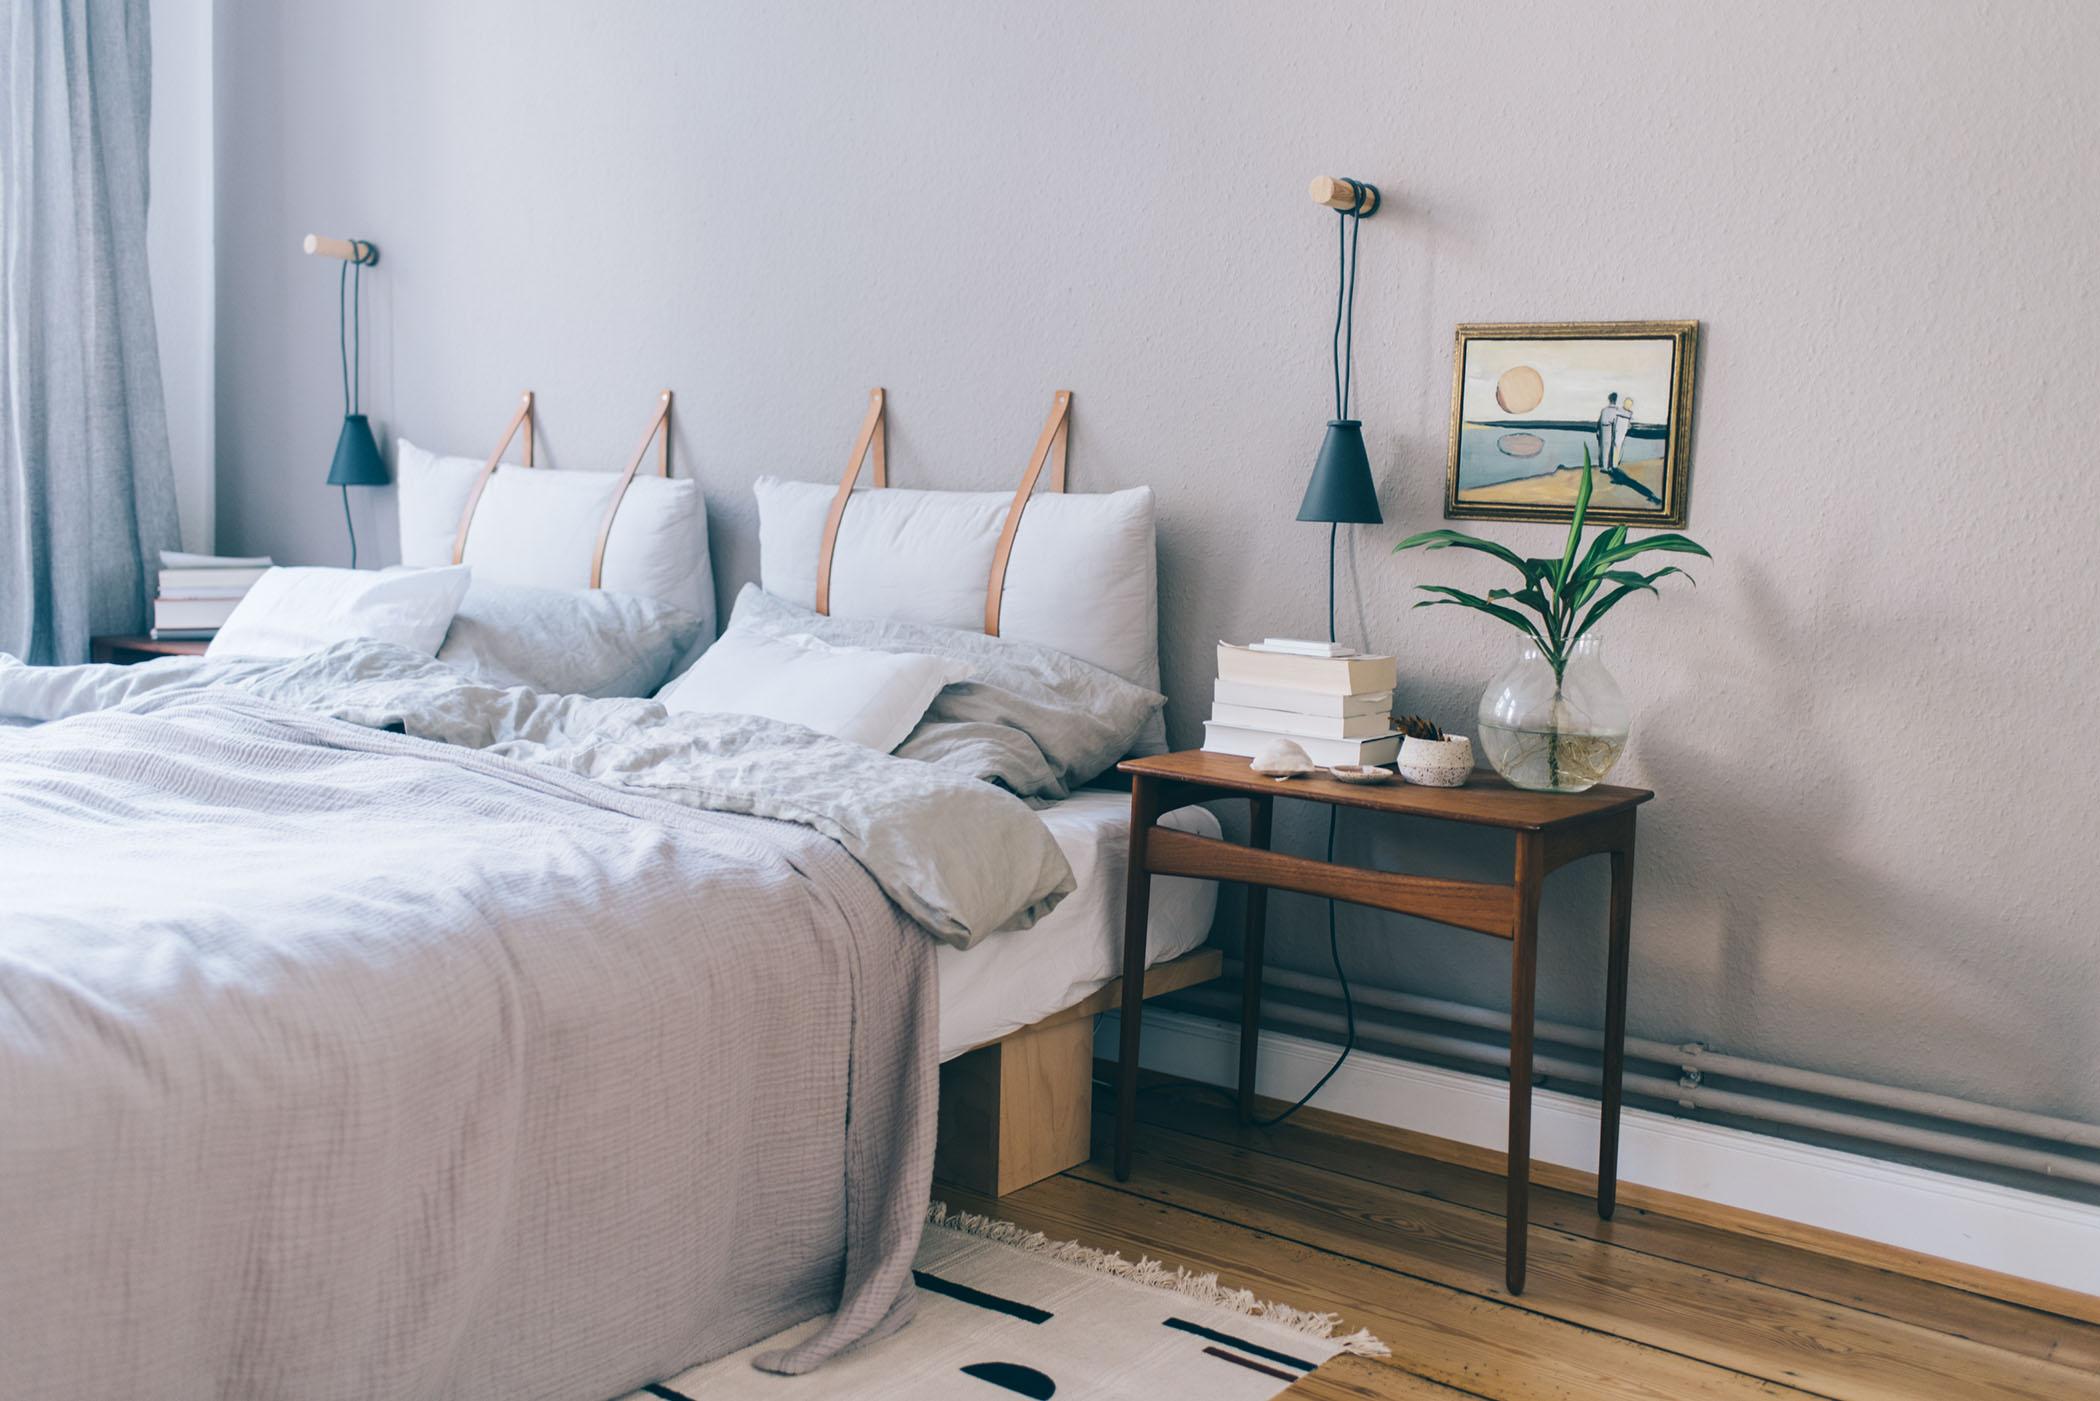 femtastics-Anna-Vera-Piendl-paulsvera-Schlafzimmer-Bett-DIY